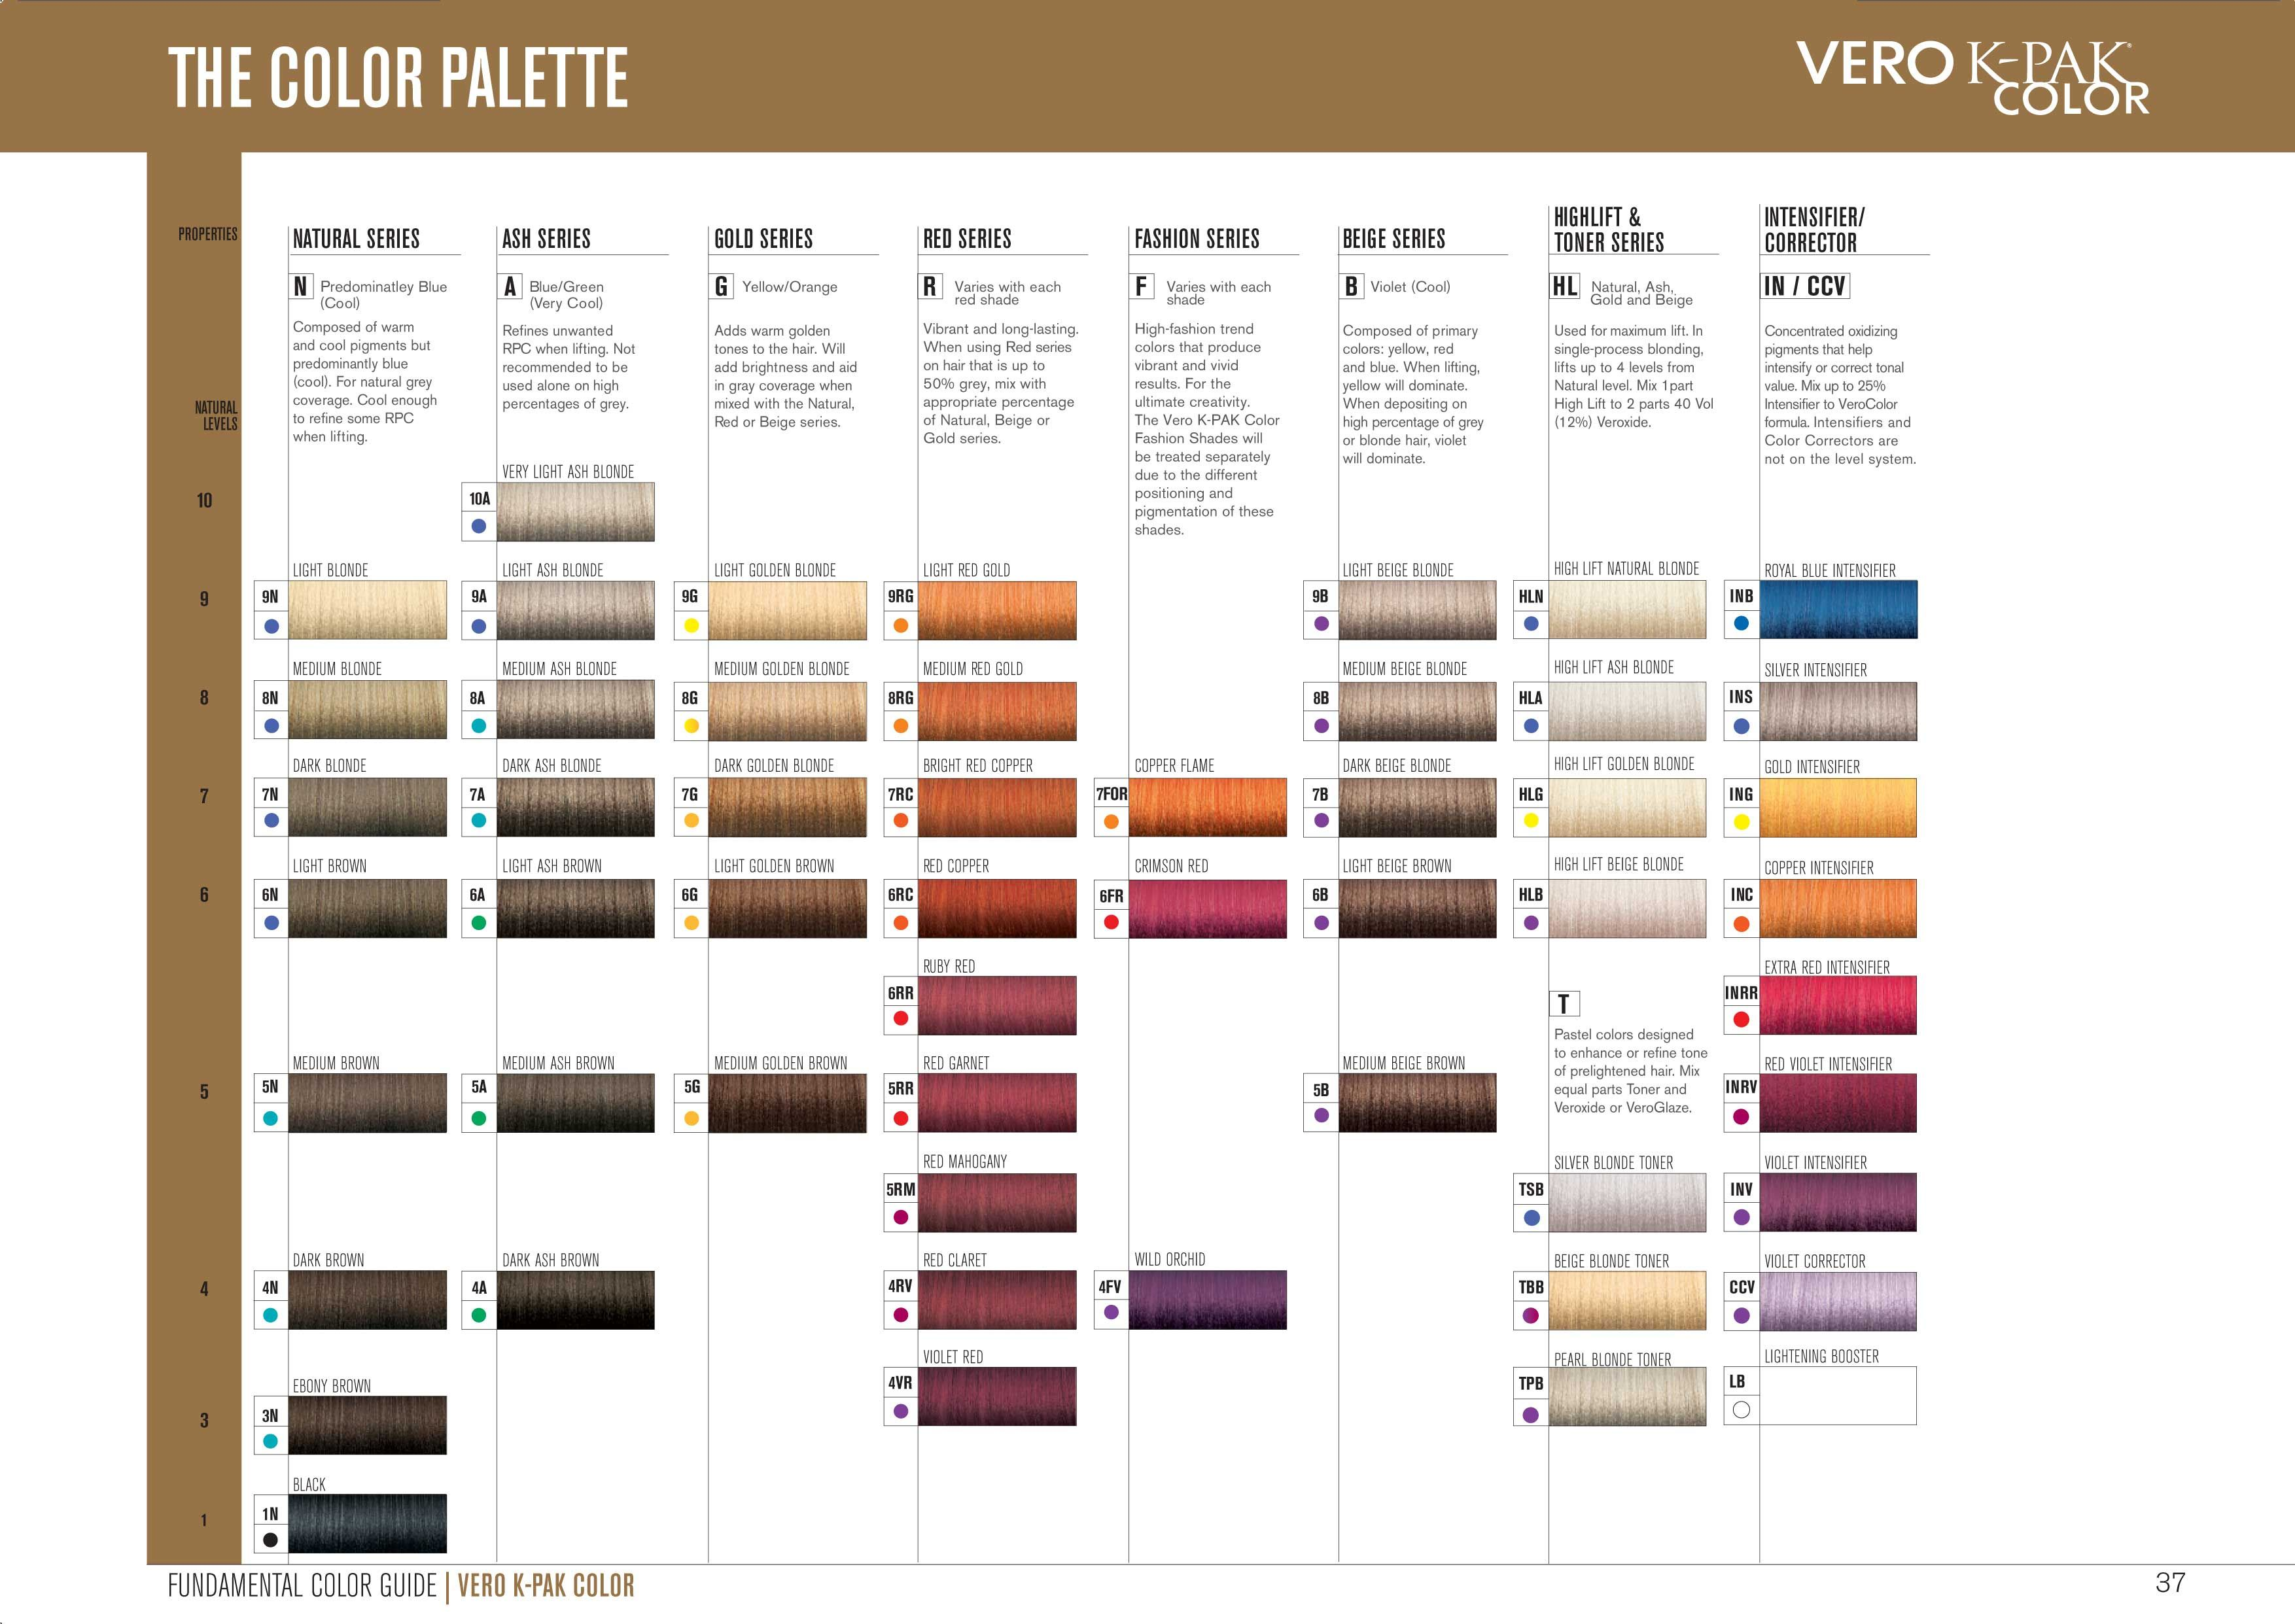 Joico Hair Color Chart Vero Color Chart Jpg 3508 2483 Joico Hair Color Hair Color Chart Joico Color